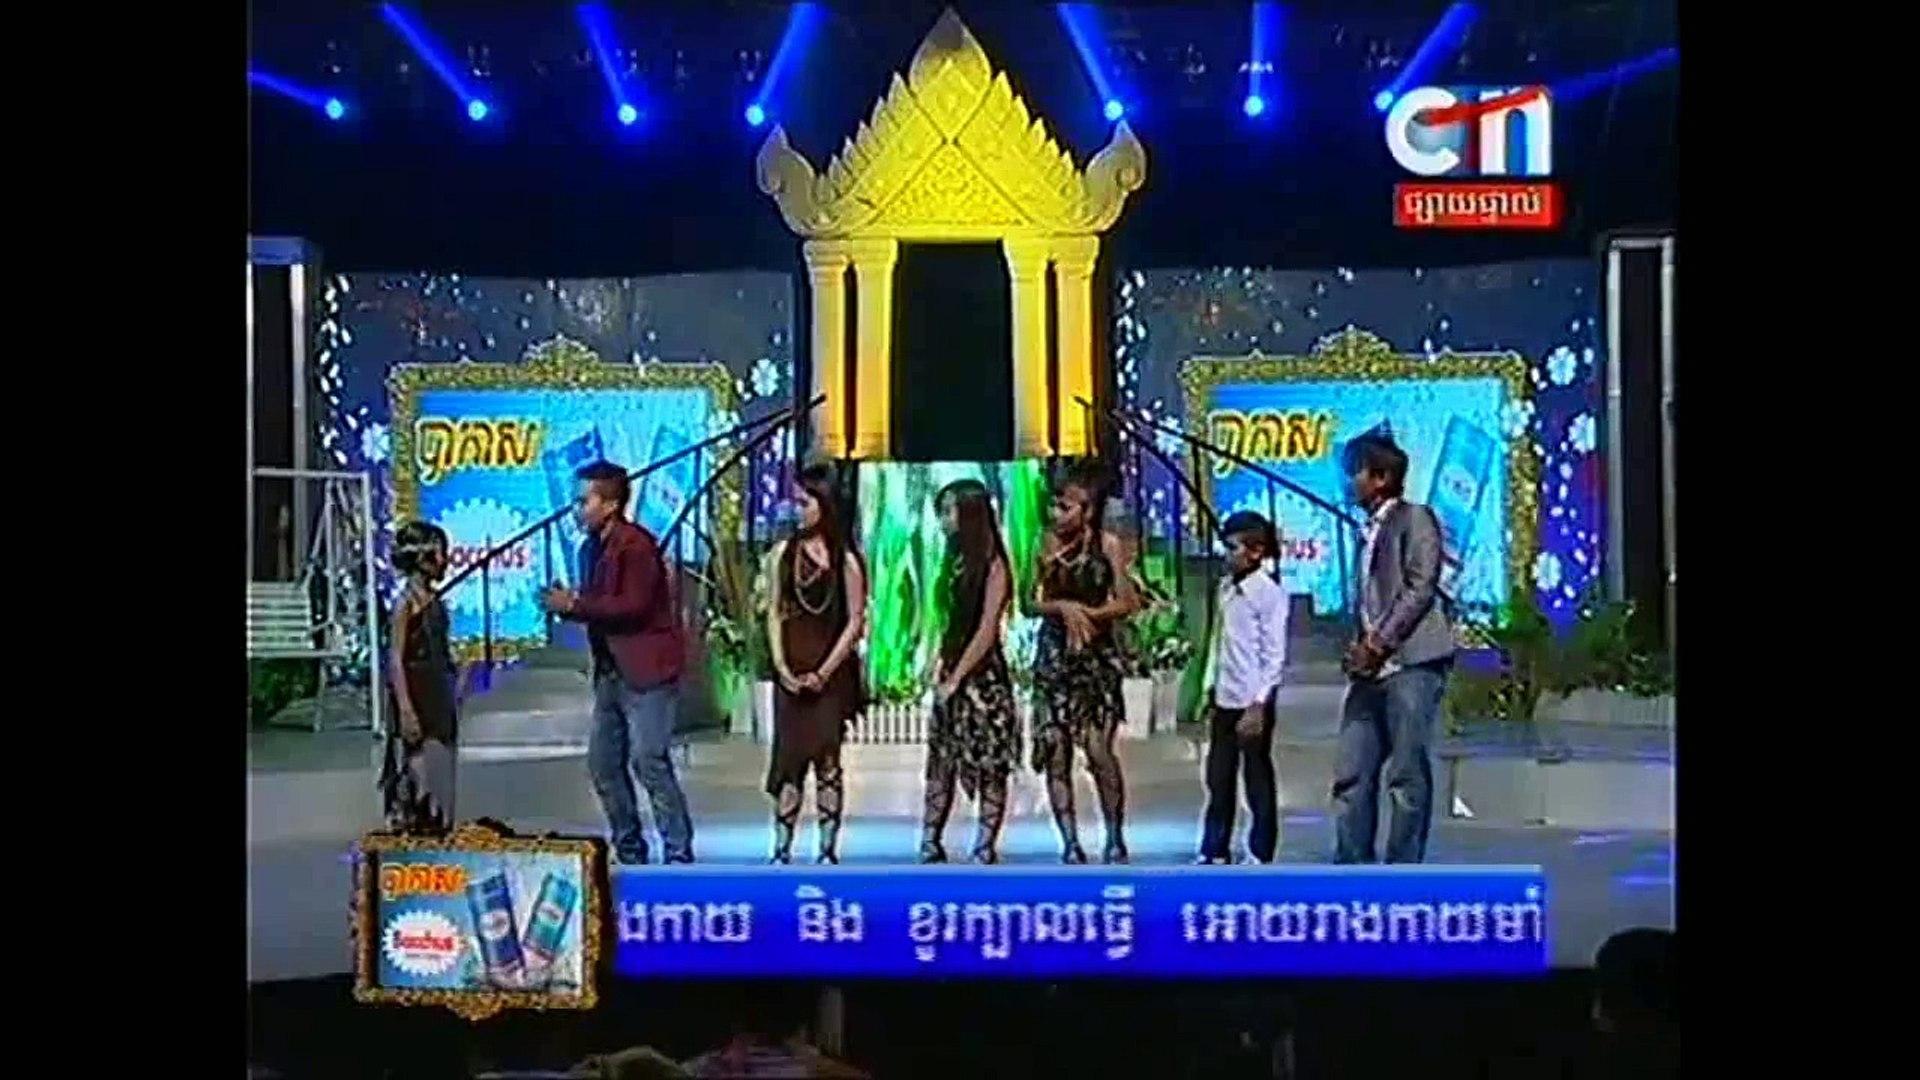 Khmer Comedy - Chao Lok Ta Comedy - 02 May 2015, CTN Comedy || Grandchildren Comedy